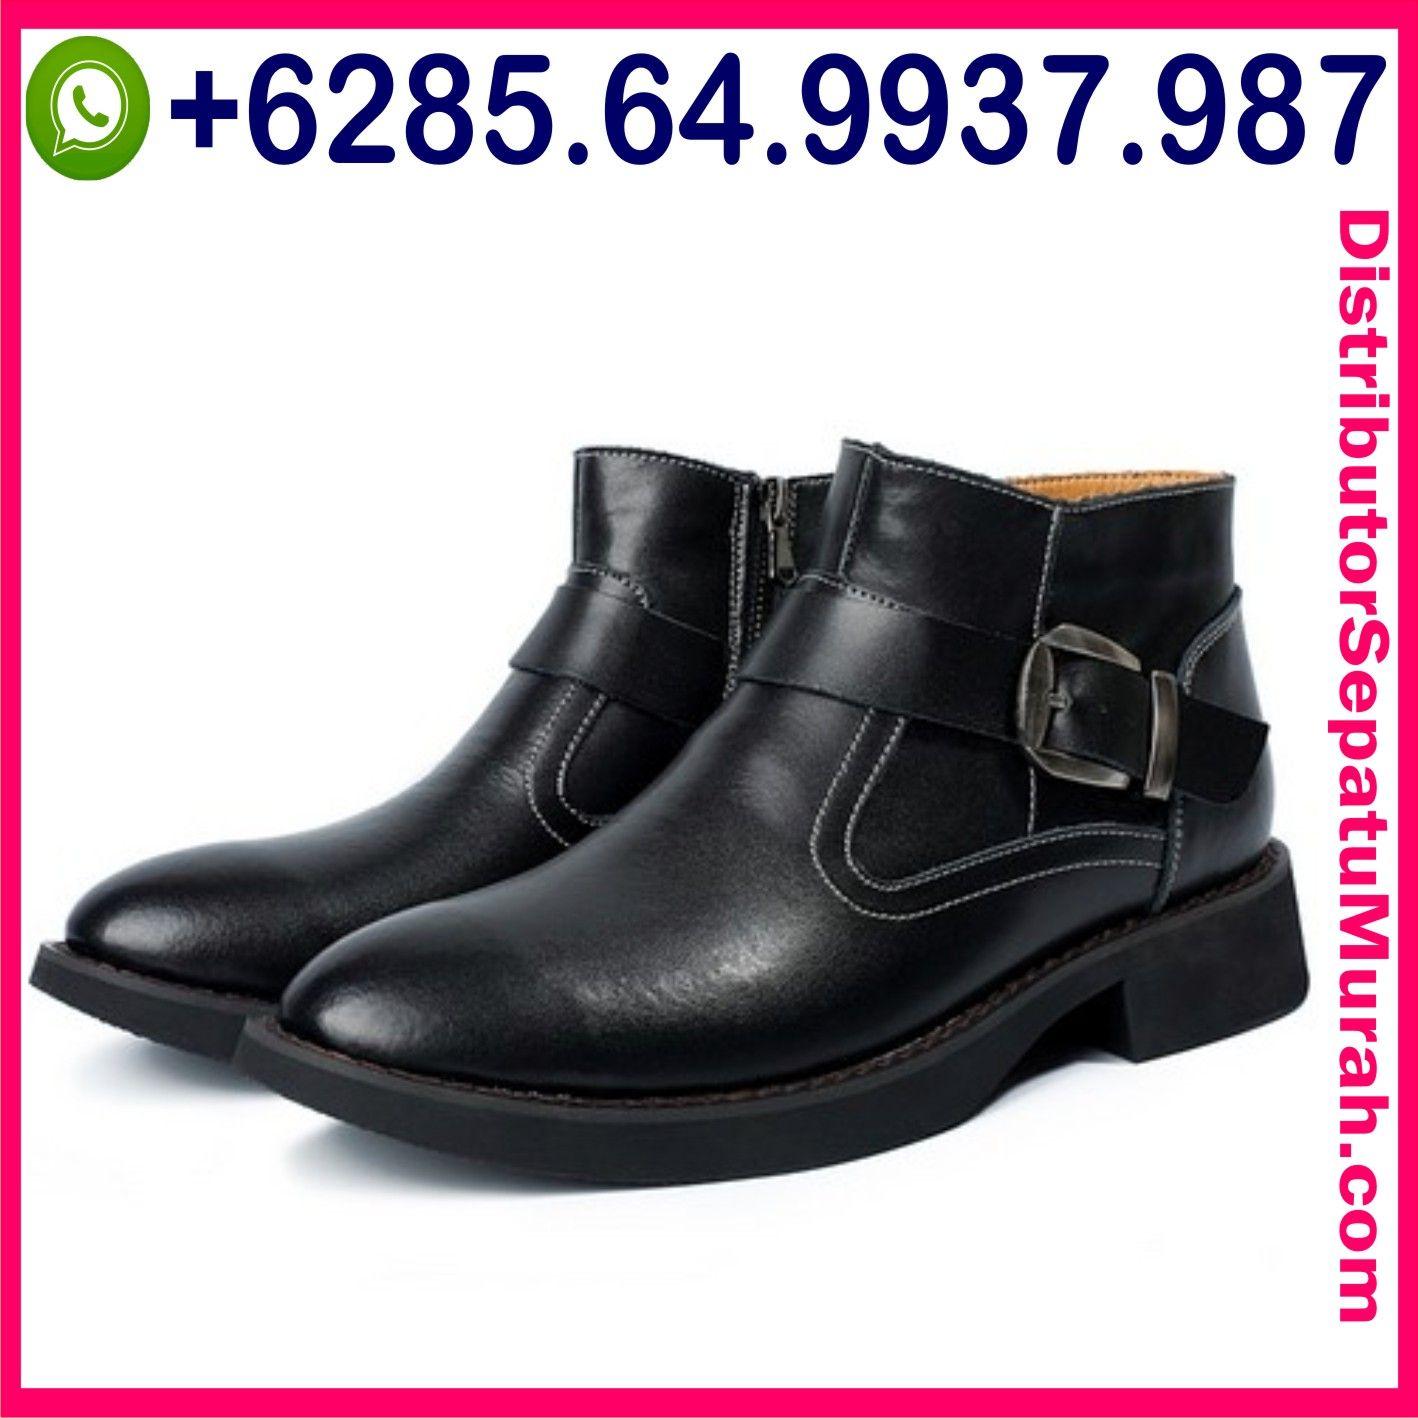 SEPATU PRIA Boots, Shoes, Fashion